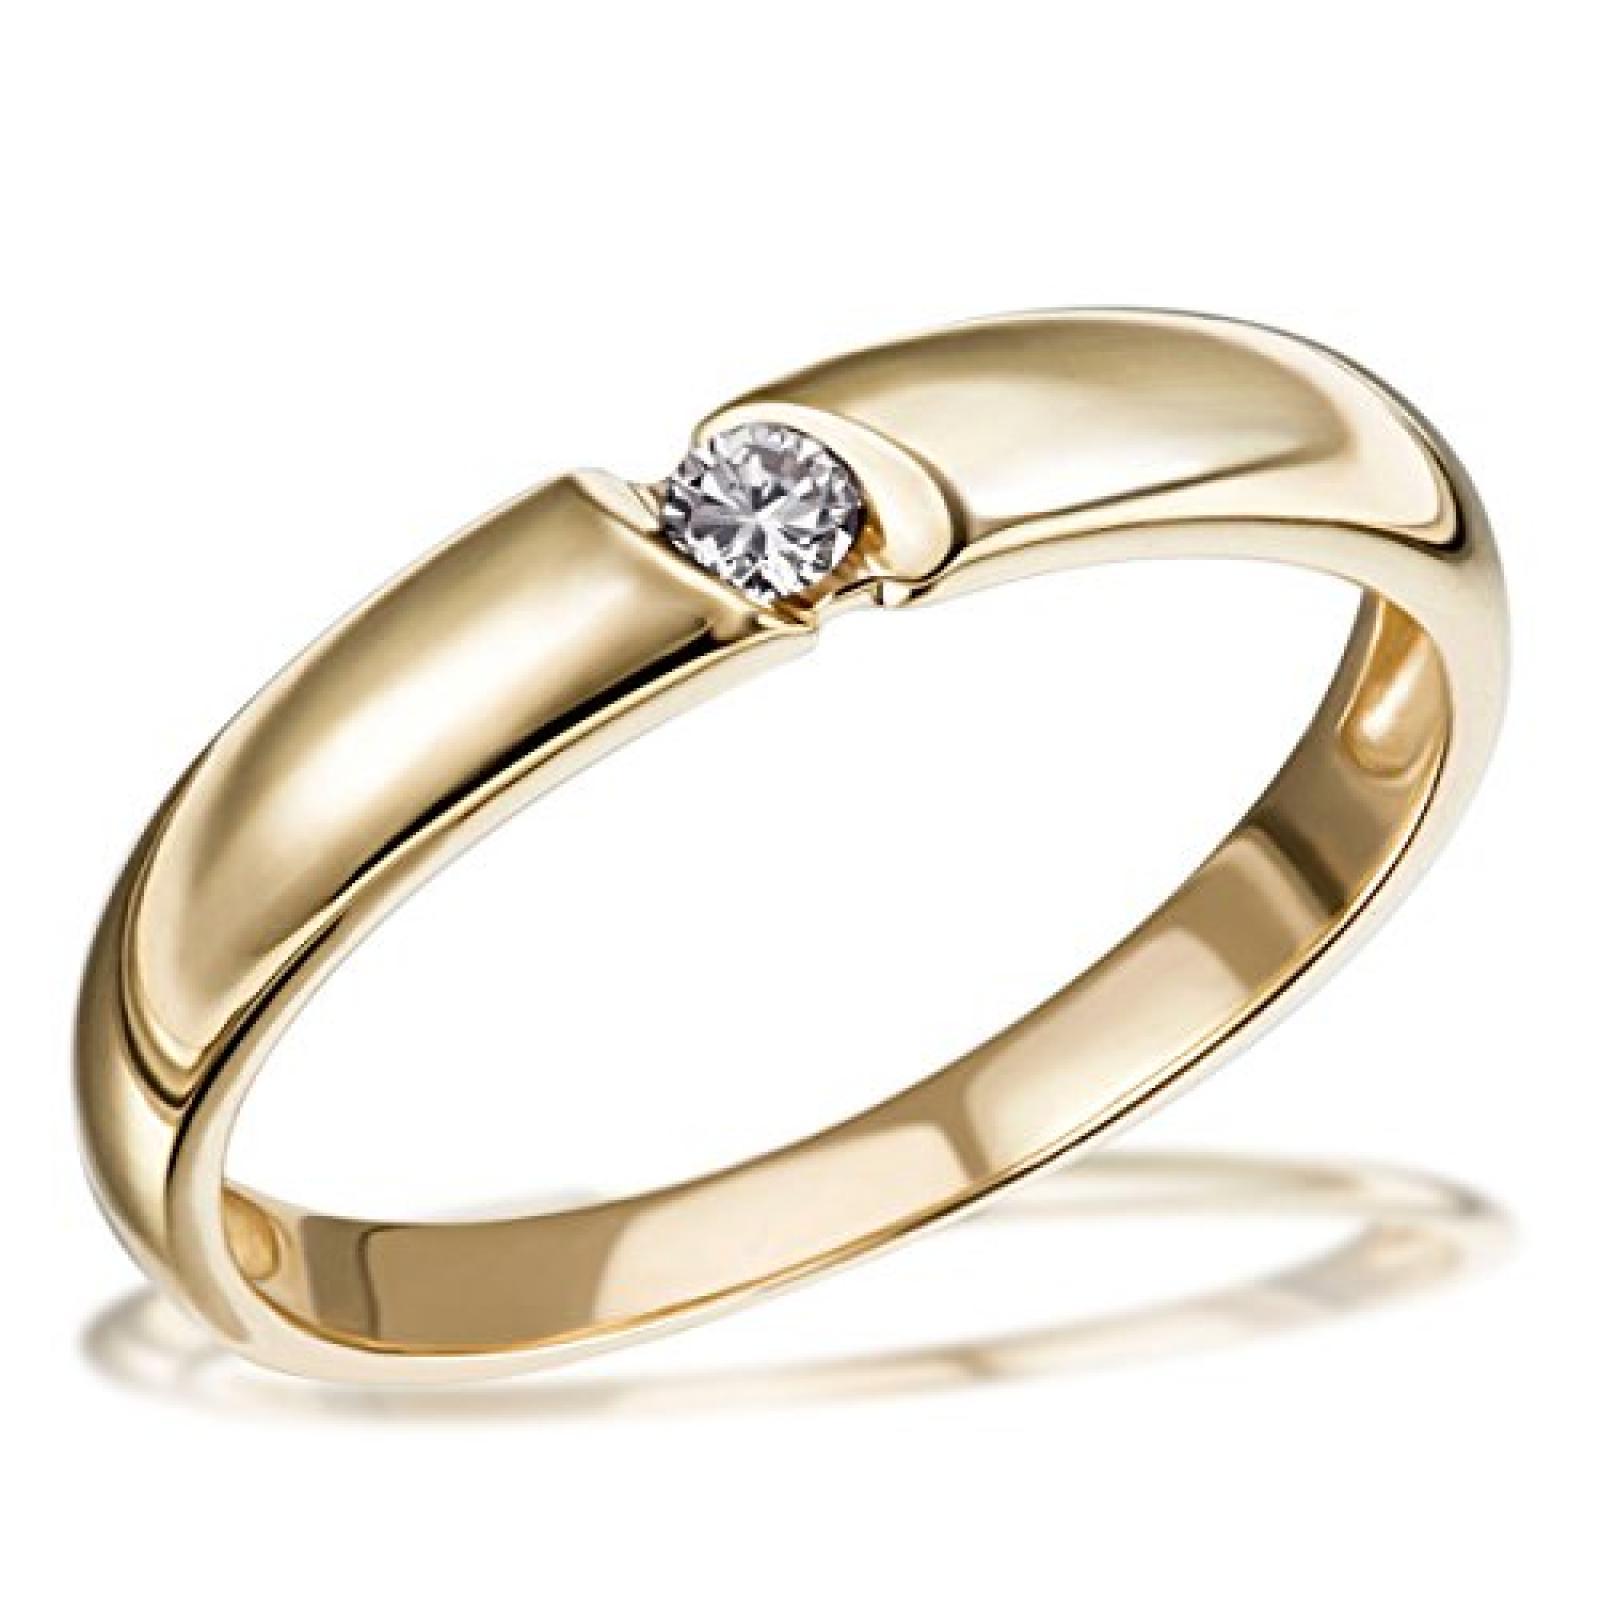 Goldmaid Damen-Ring Solitär Verlobungsring 585 Gelbgold 1 Brillant 0,07 ct. So R730GG